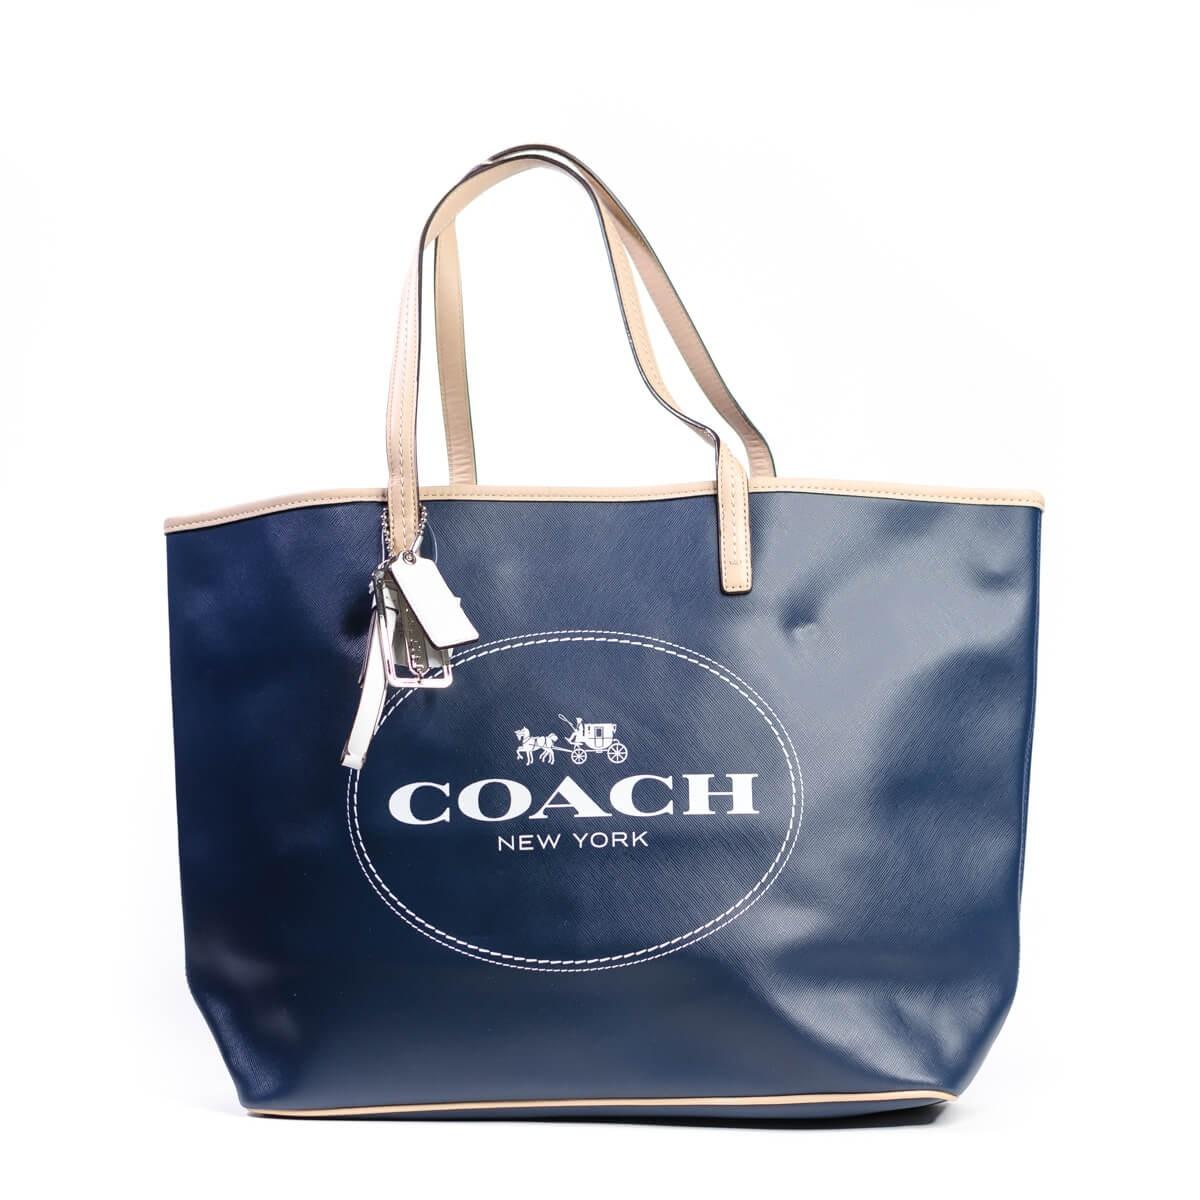 7700c24978ed Coach Blue Tote Bag